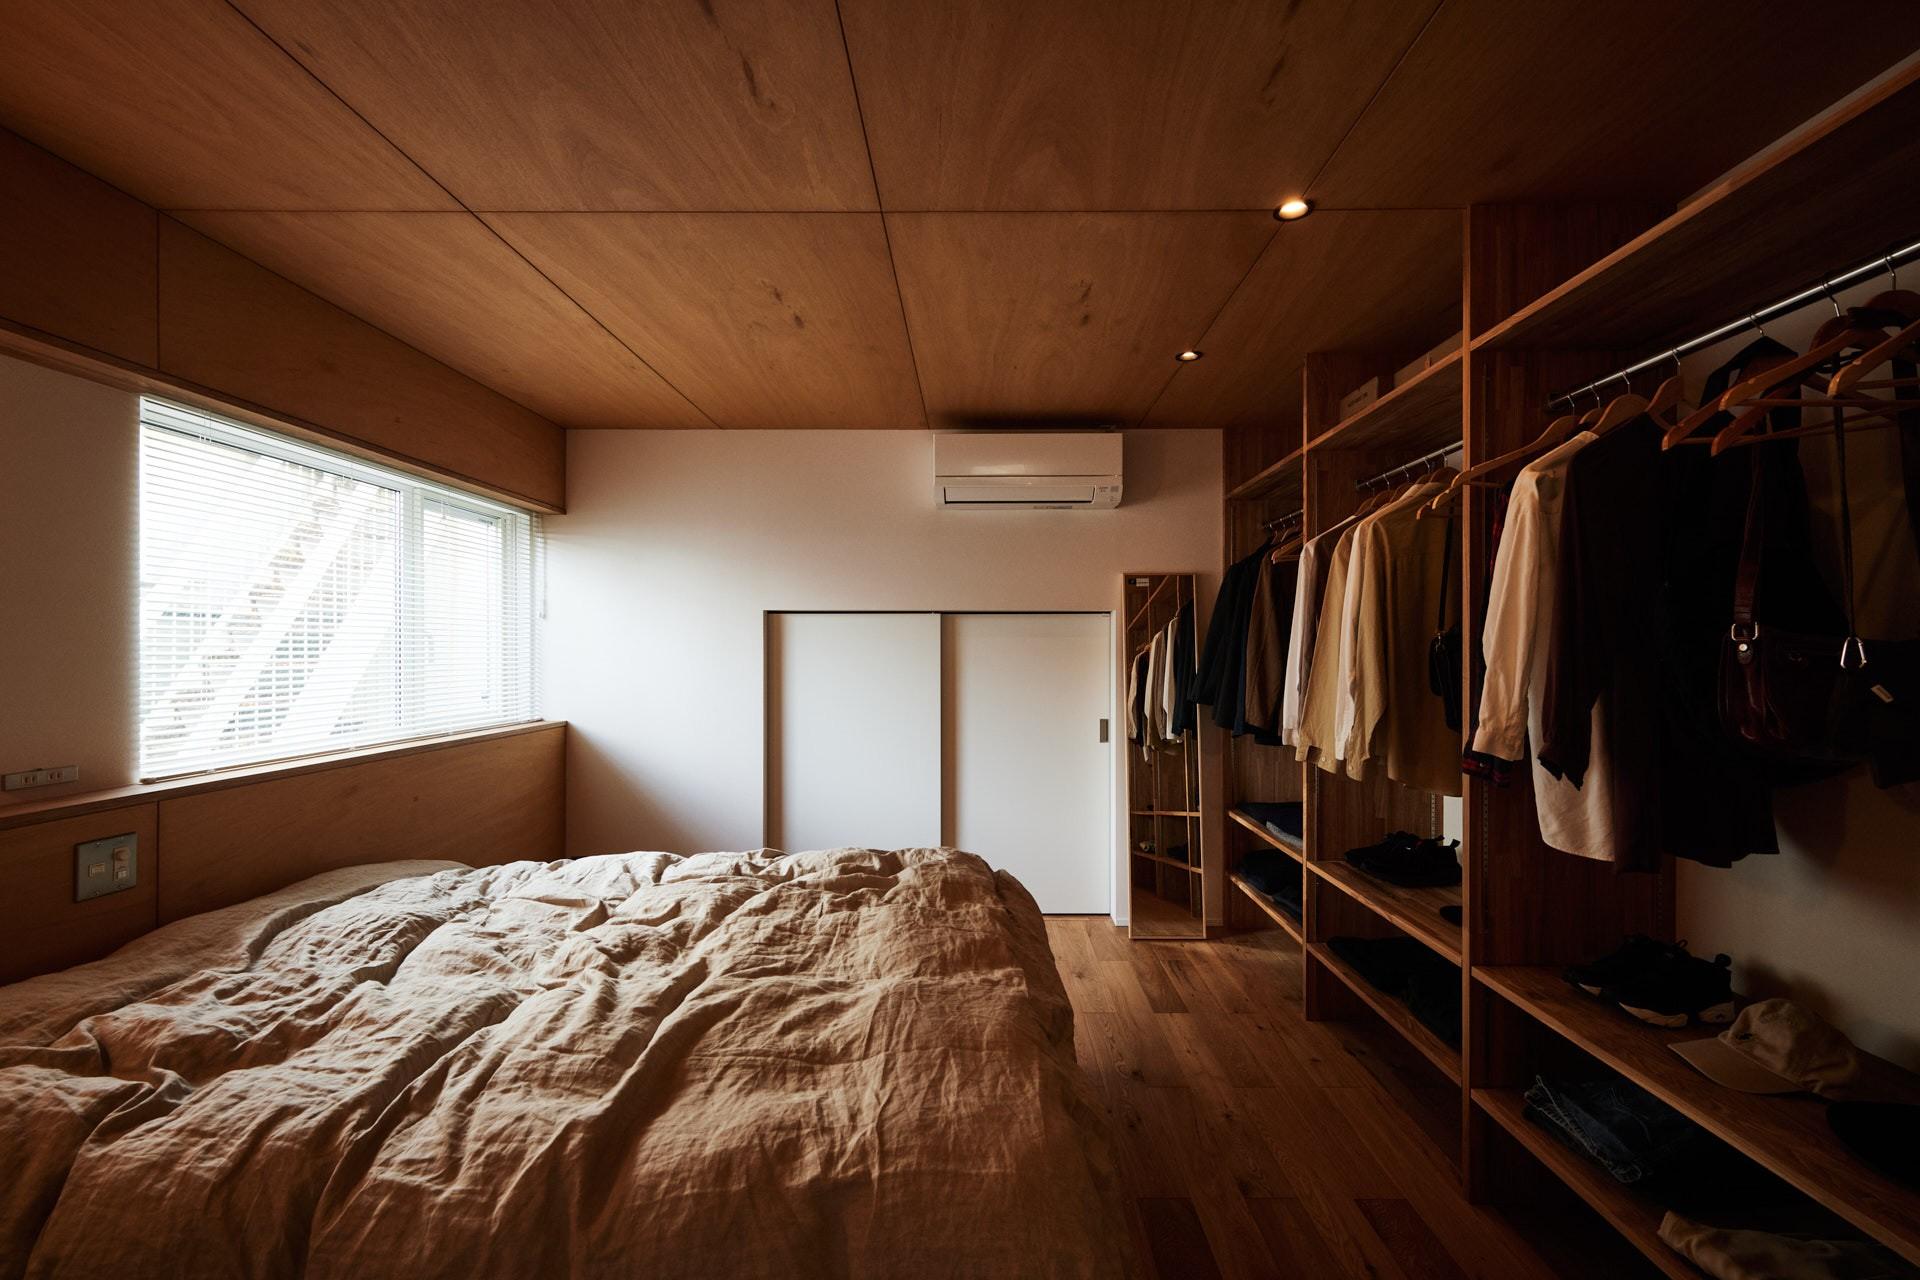 DETAIL HOME(ディテールホーム)「素材を楽しむ小さな家」のシンプル・ナチュラルな居室の実例写真